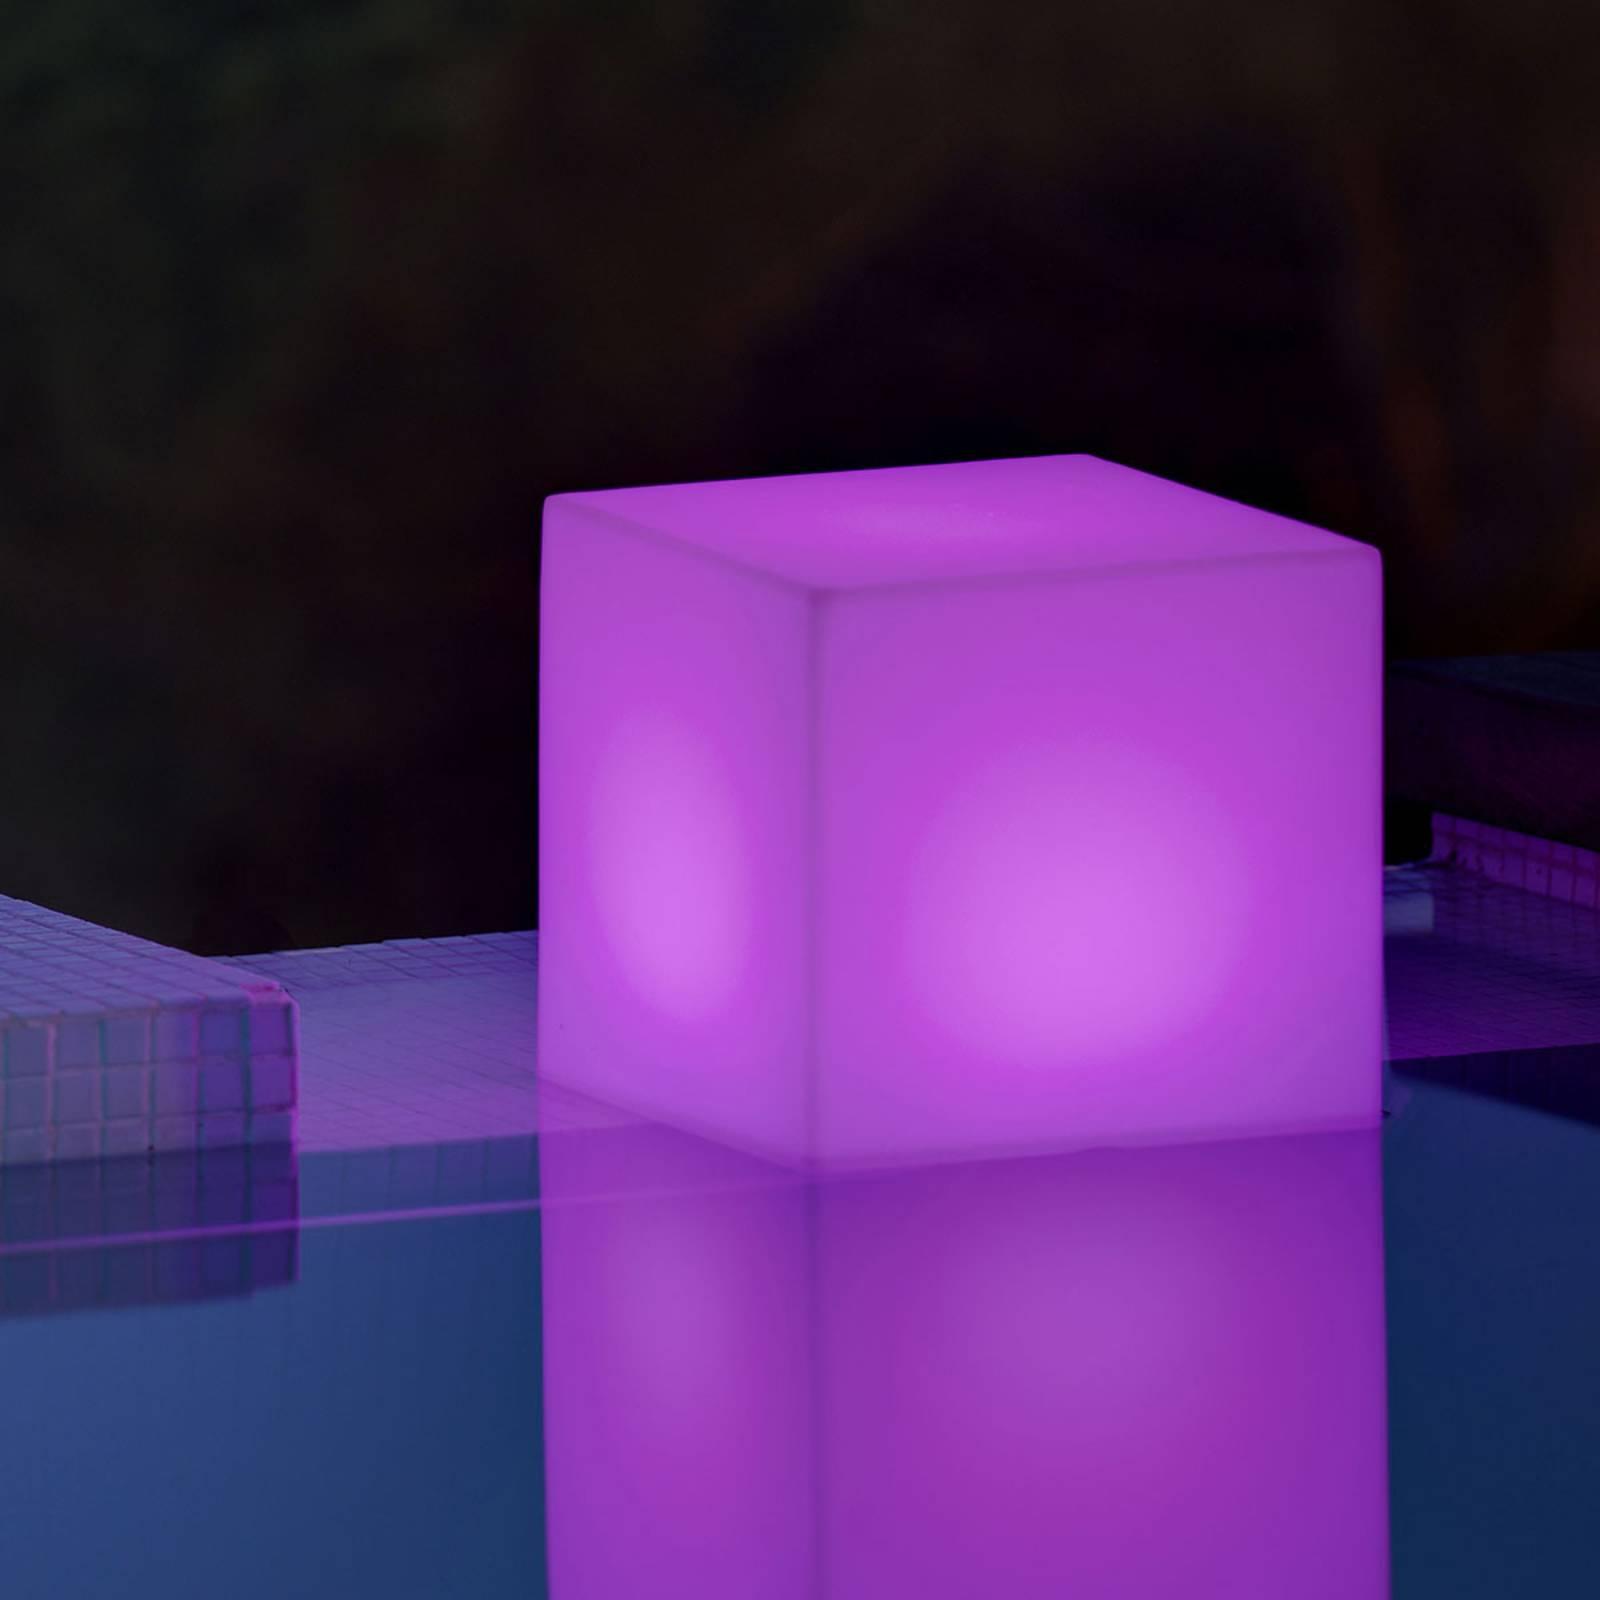 Newgarden lampa solarna Cuby kostka, 32 cm